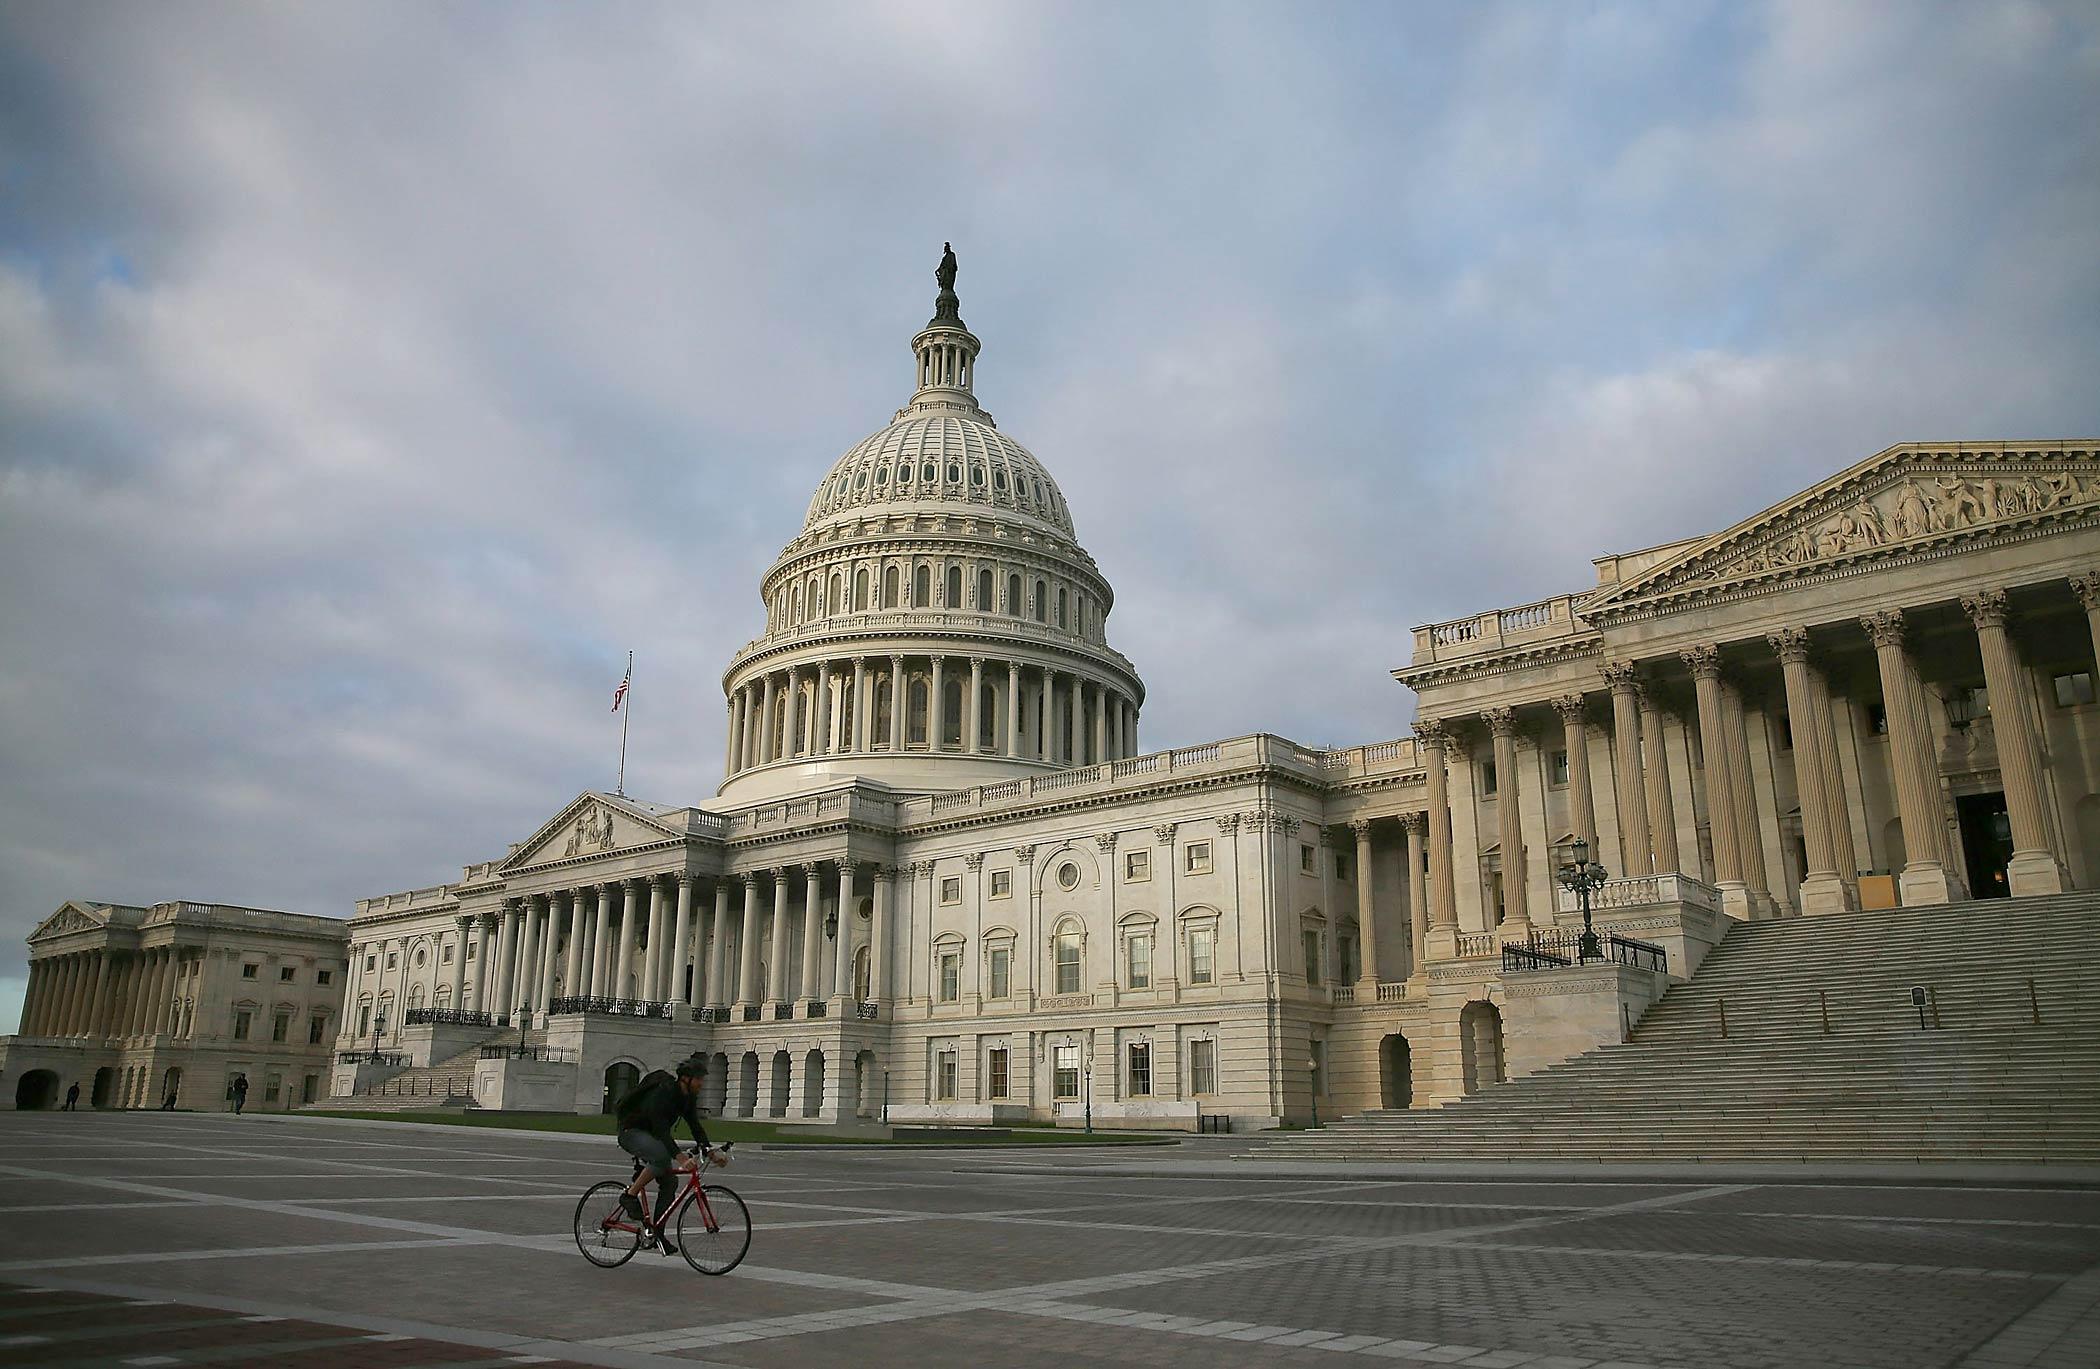 The U.S. Capitol in Washington in 2013.